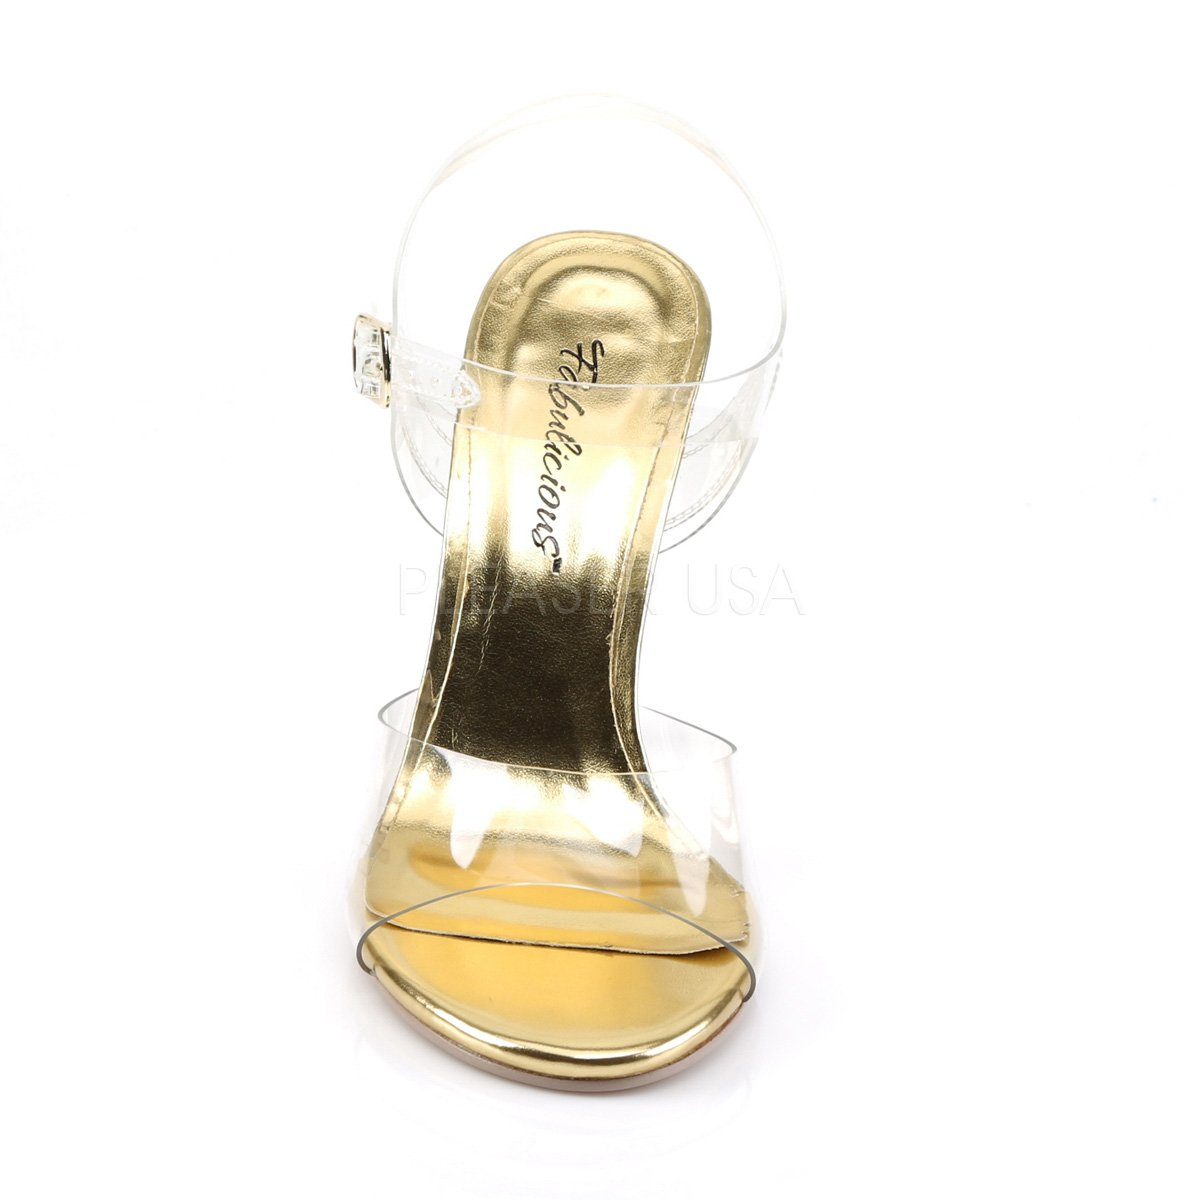 Fabulicious Women's Cle408/c Platform Sandal B01MRQZBA5 7 B(M) US|Clr Lucite-gold